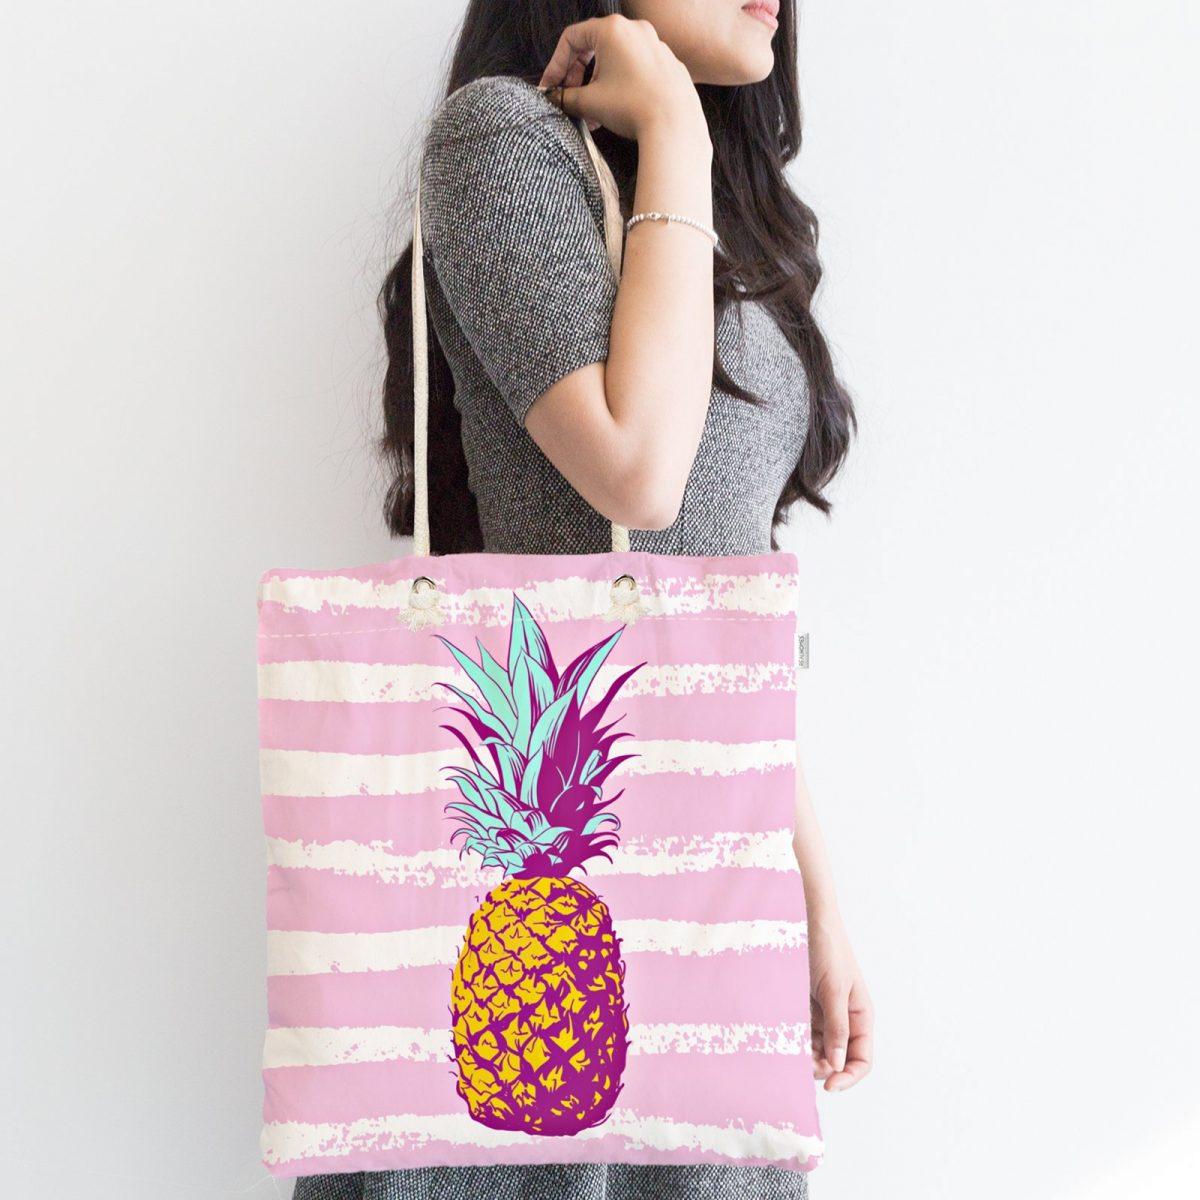 Canlı Renkli Ananas Motifli Dijital Baskılı Fermuarlı Kumaş Çanta Realhomes